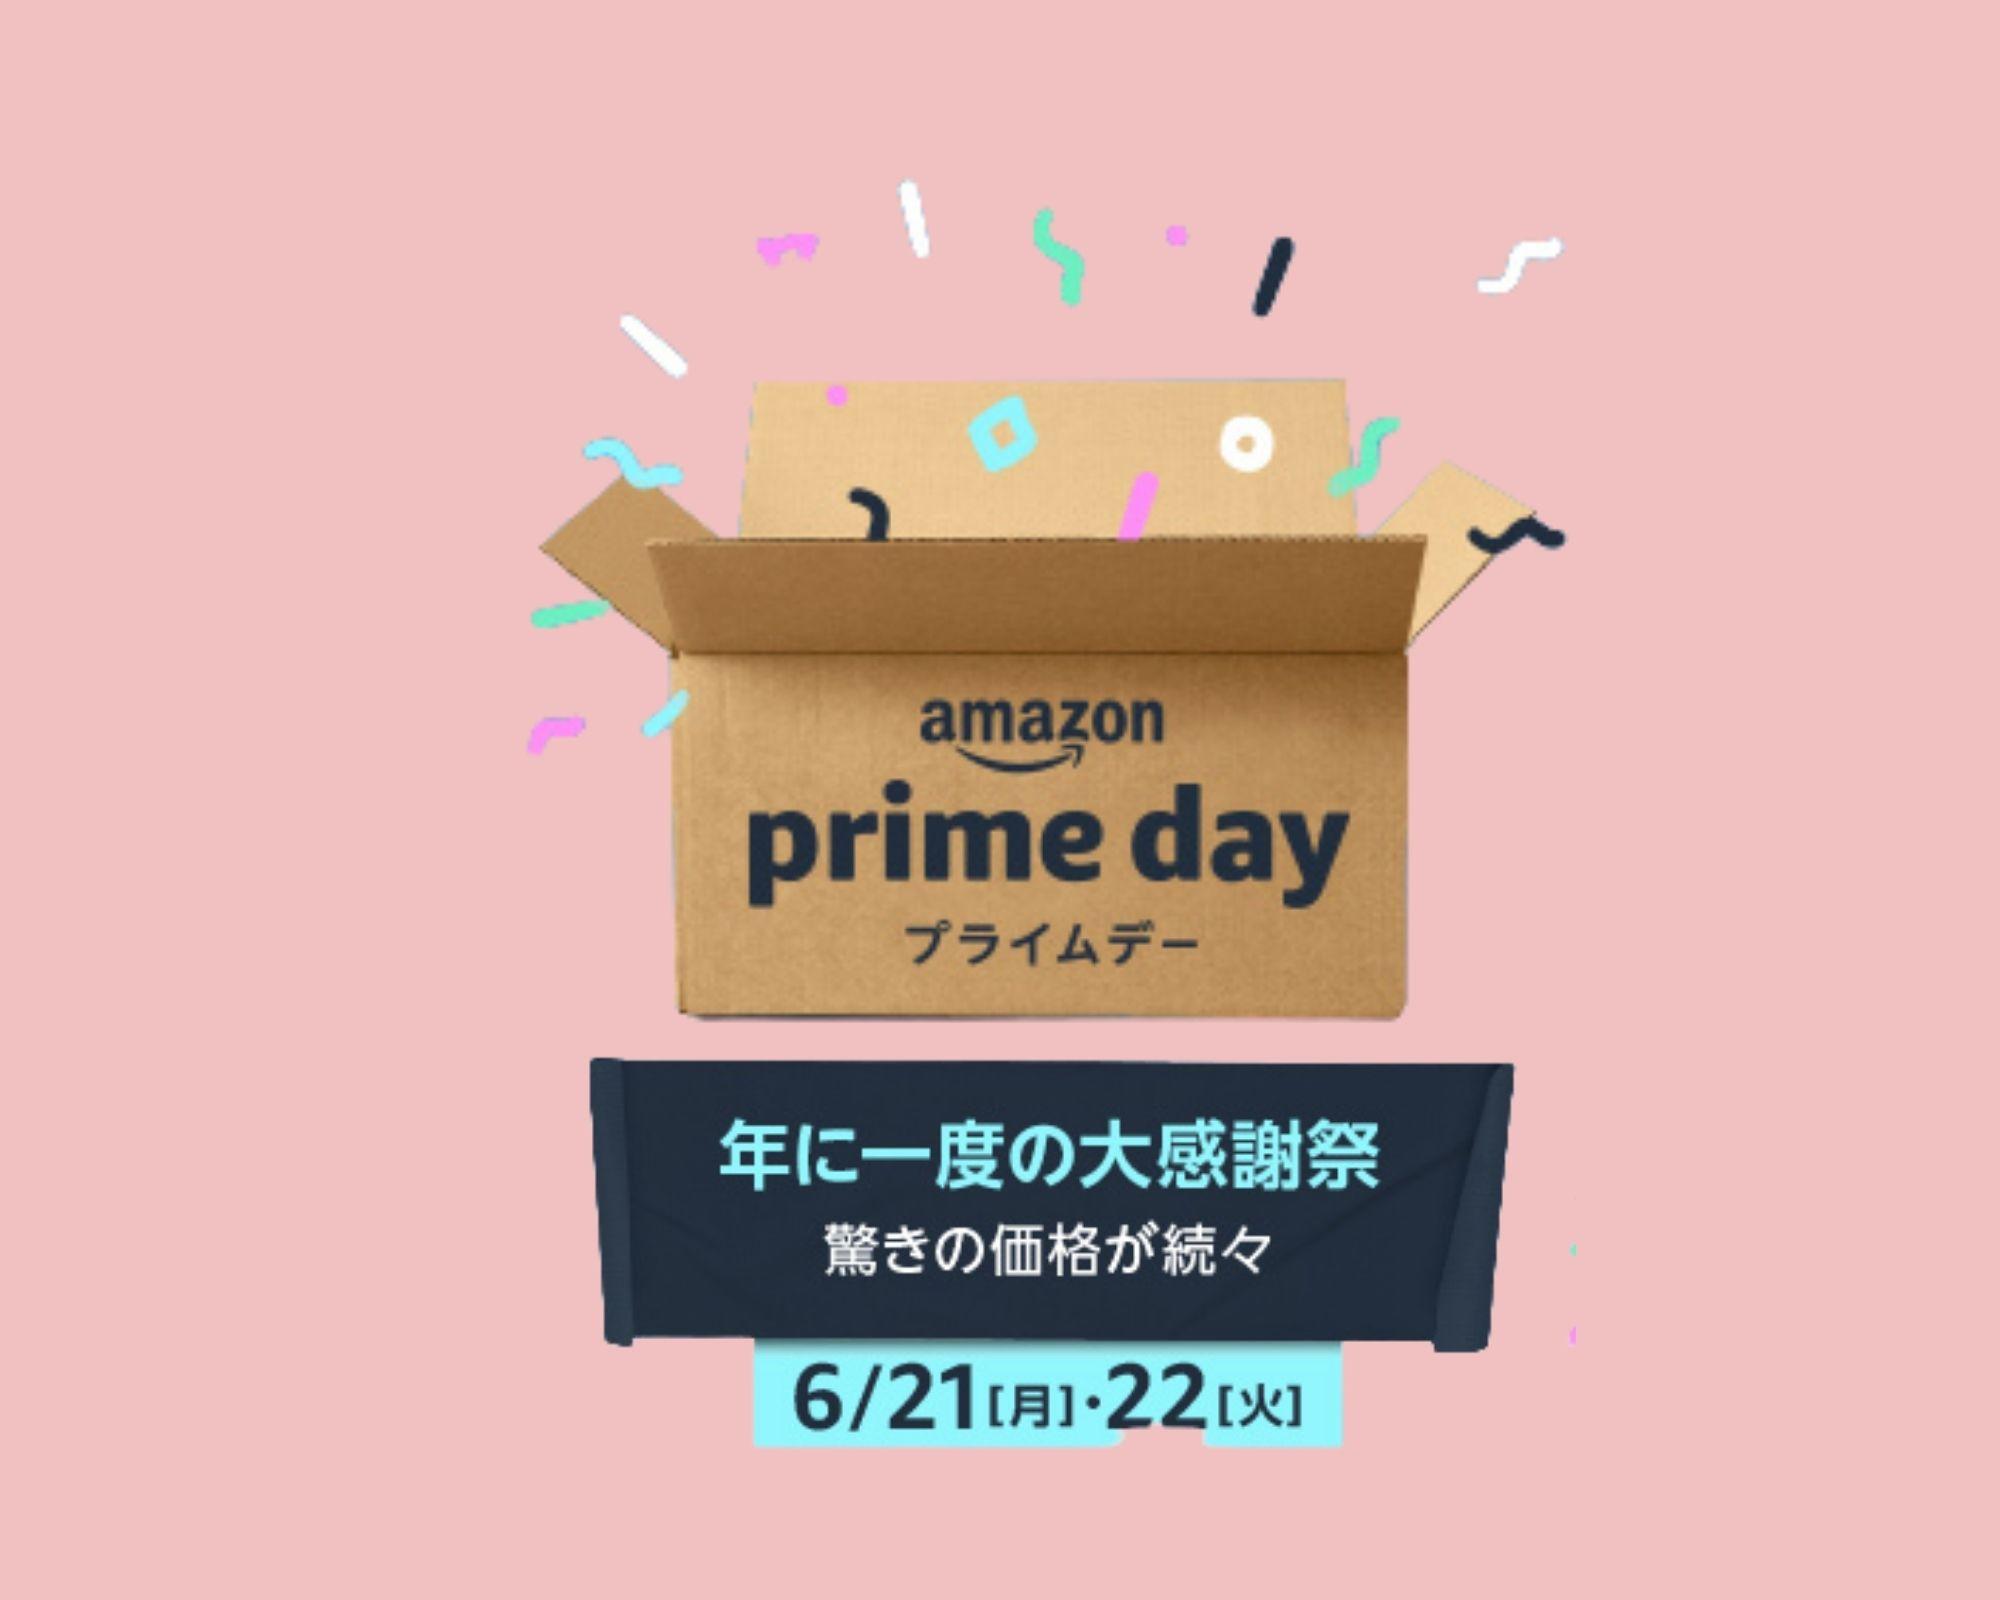 Amazonプライムデーは週明け開催! 納得のお買い物のためにしておきたいこと